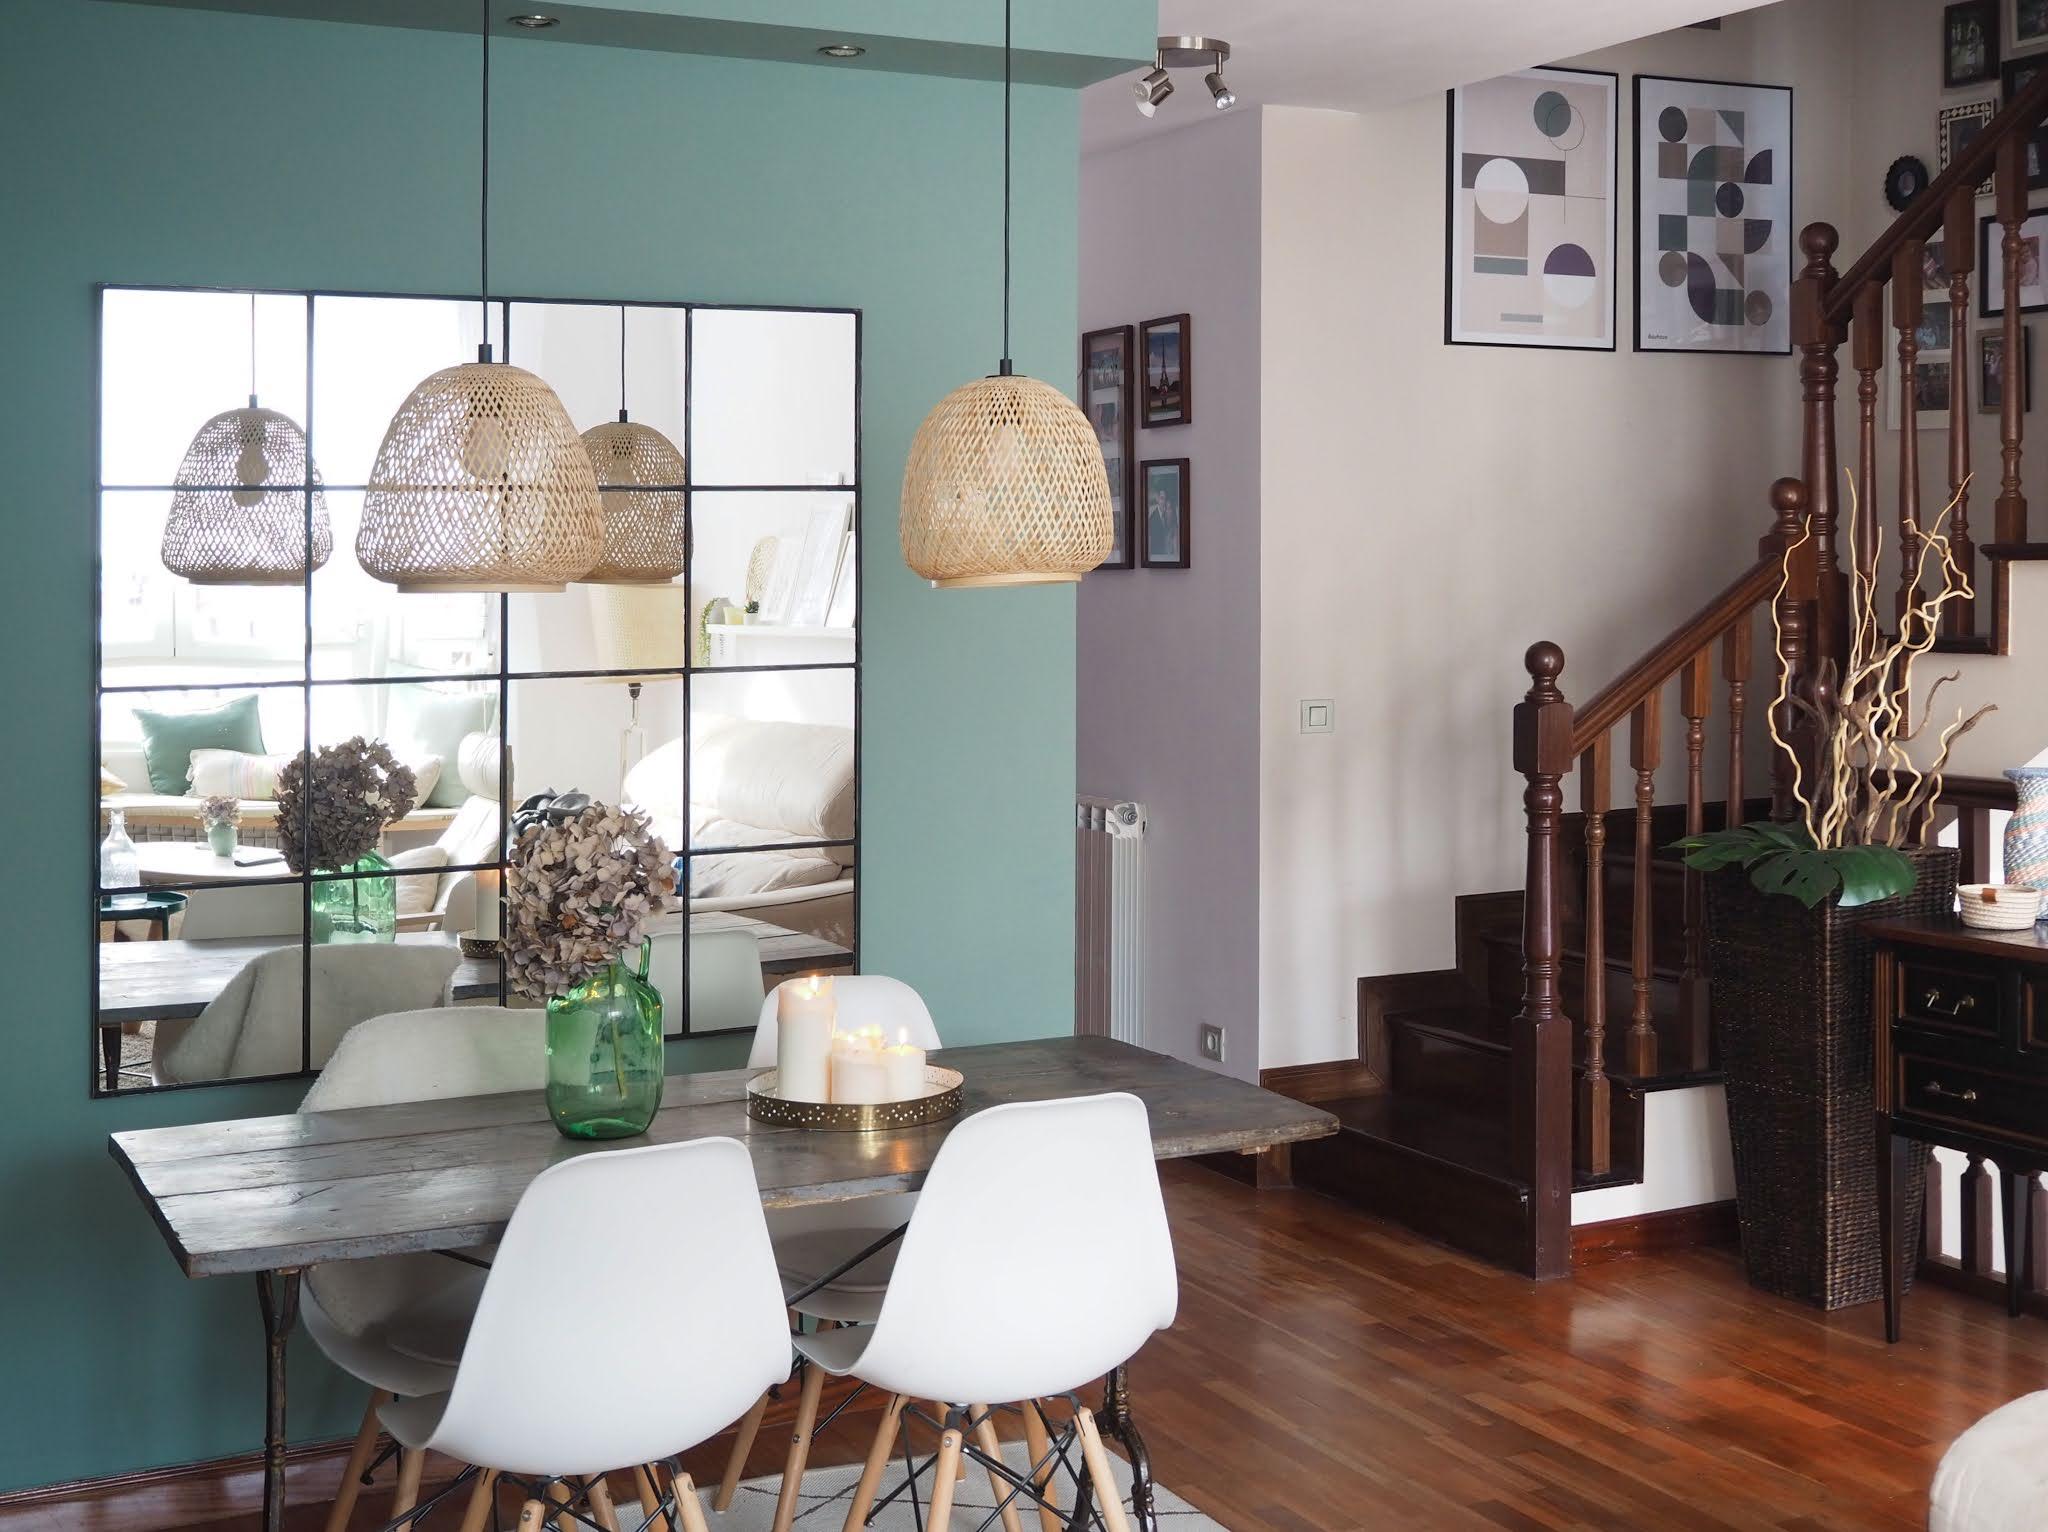 4 trucos para decorar de forma coherente vuestro hogar_12